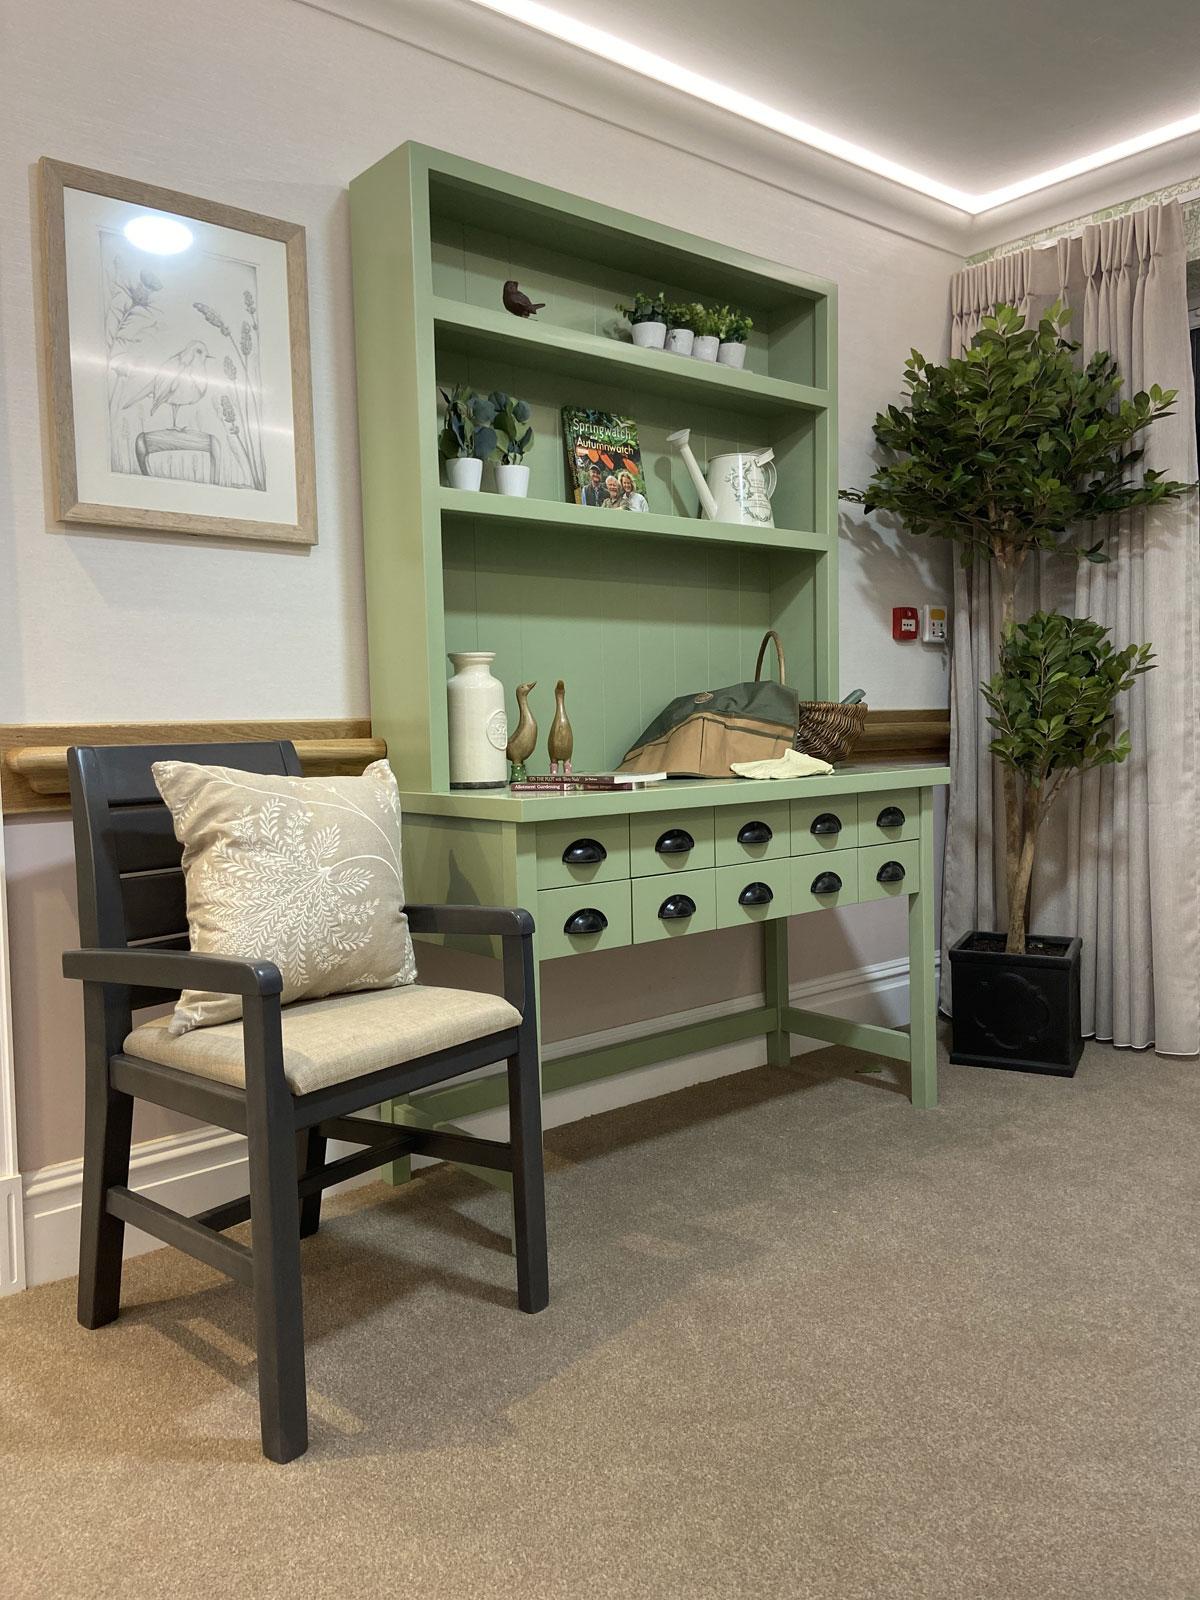 care home design, The Art of Care Home Design